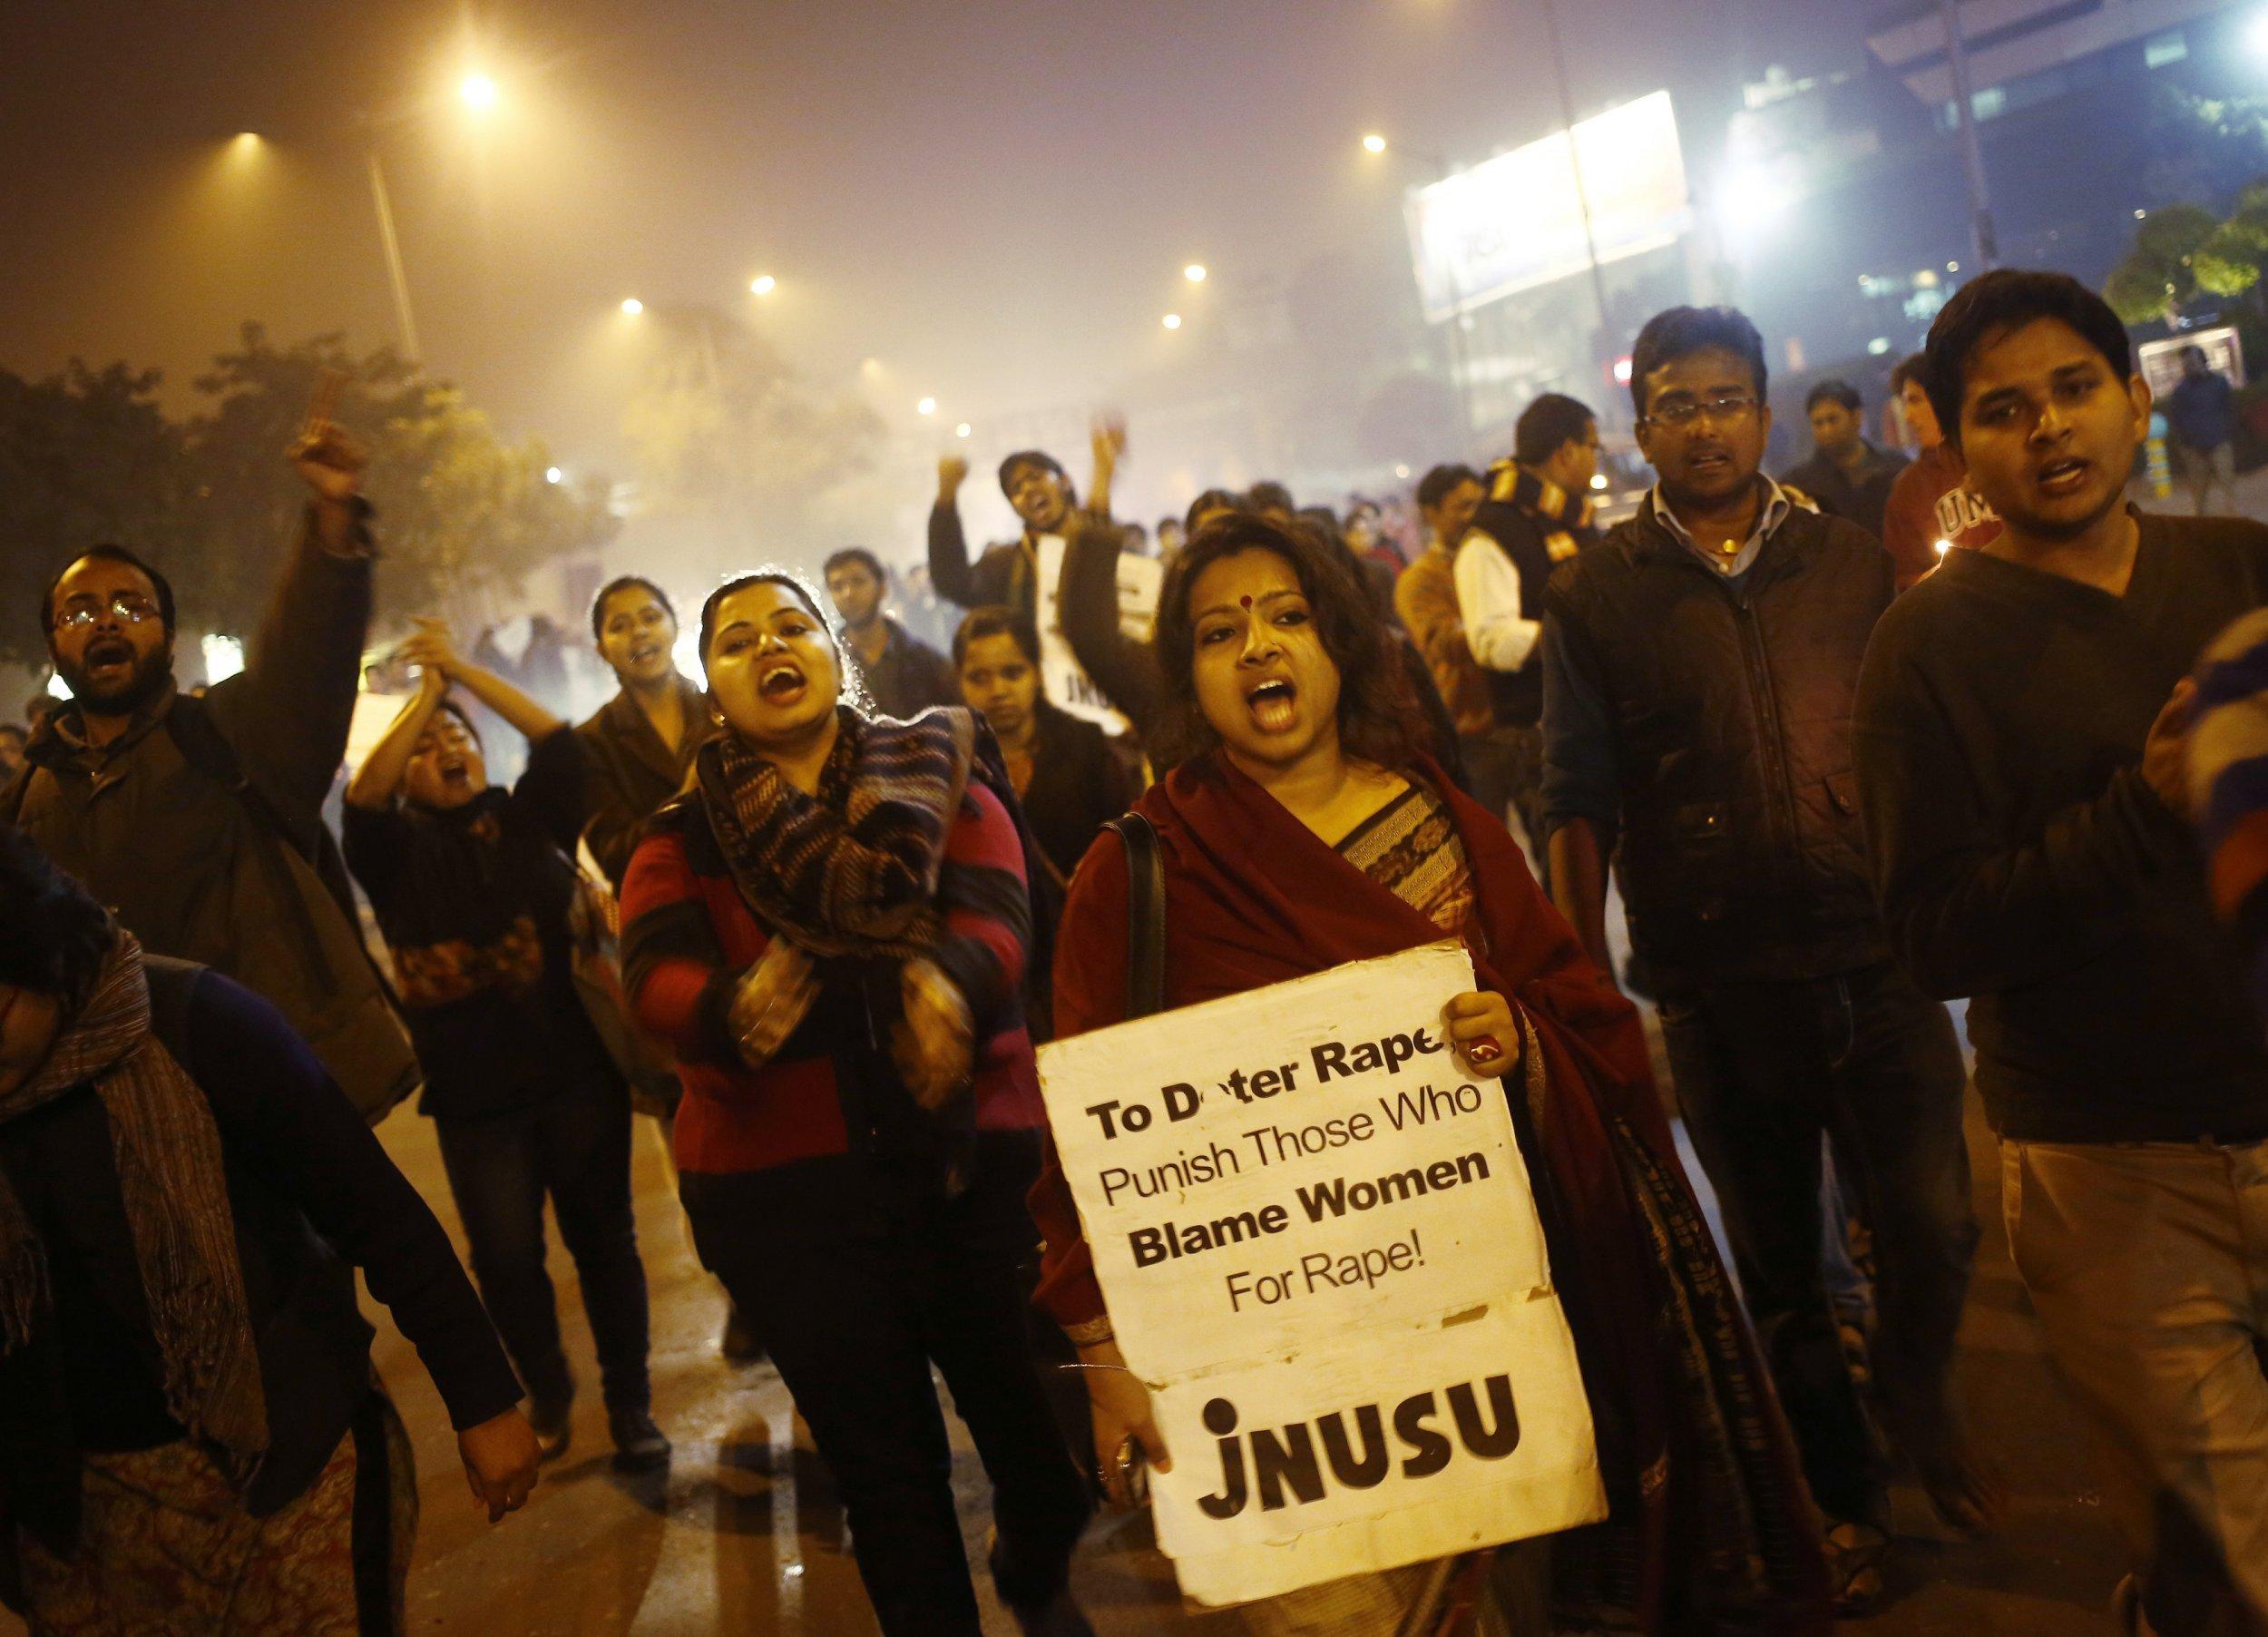 3-5-15 India rape protest